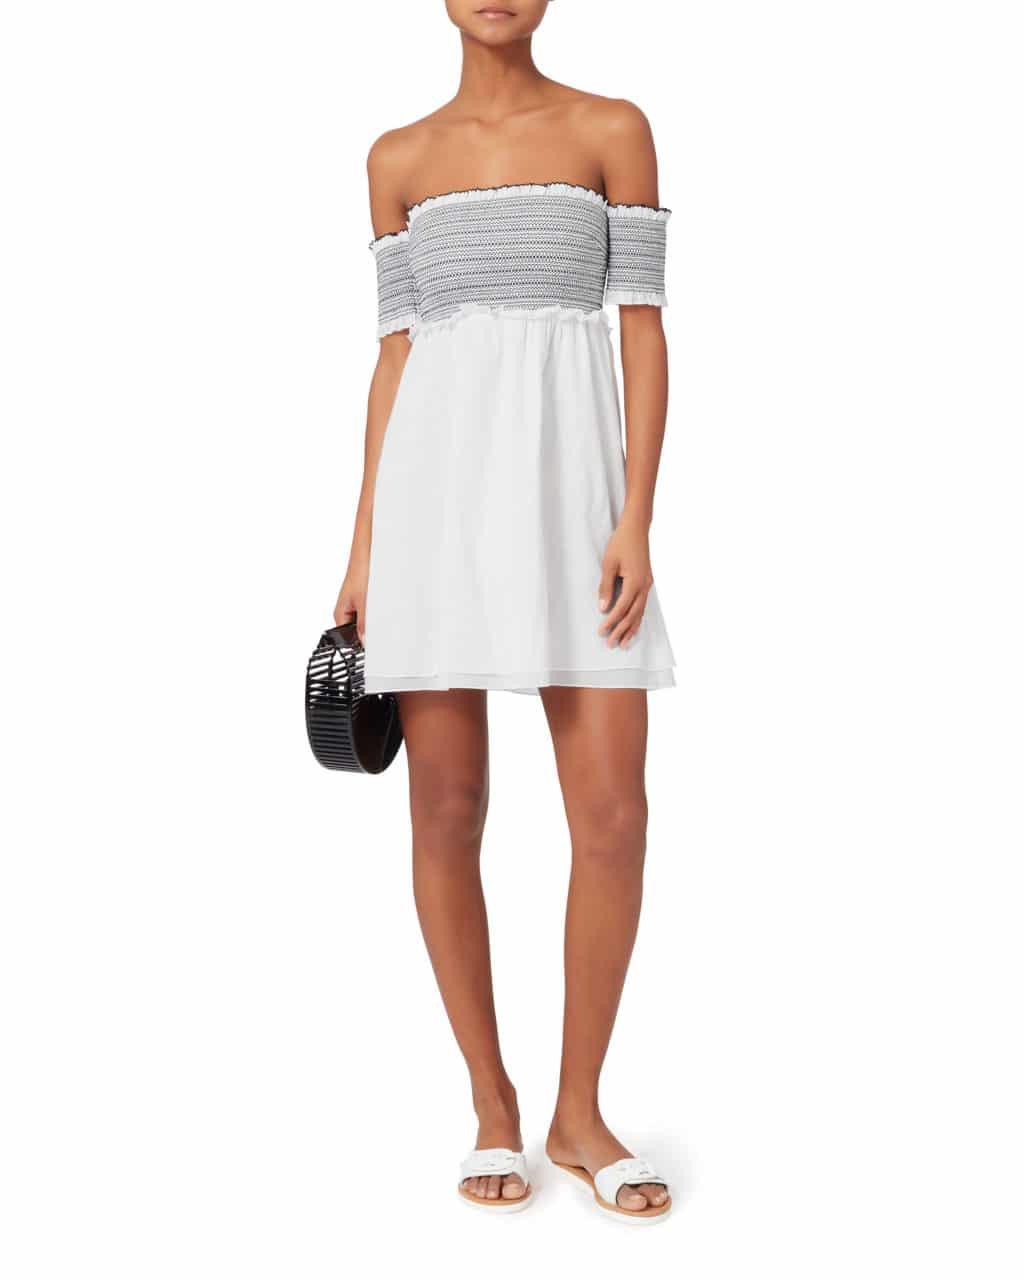 80e9f0ee1b12 KISUII Aya Smocked Off Shoulder Mini White Dress - We Select Dresses